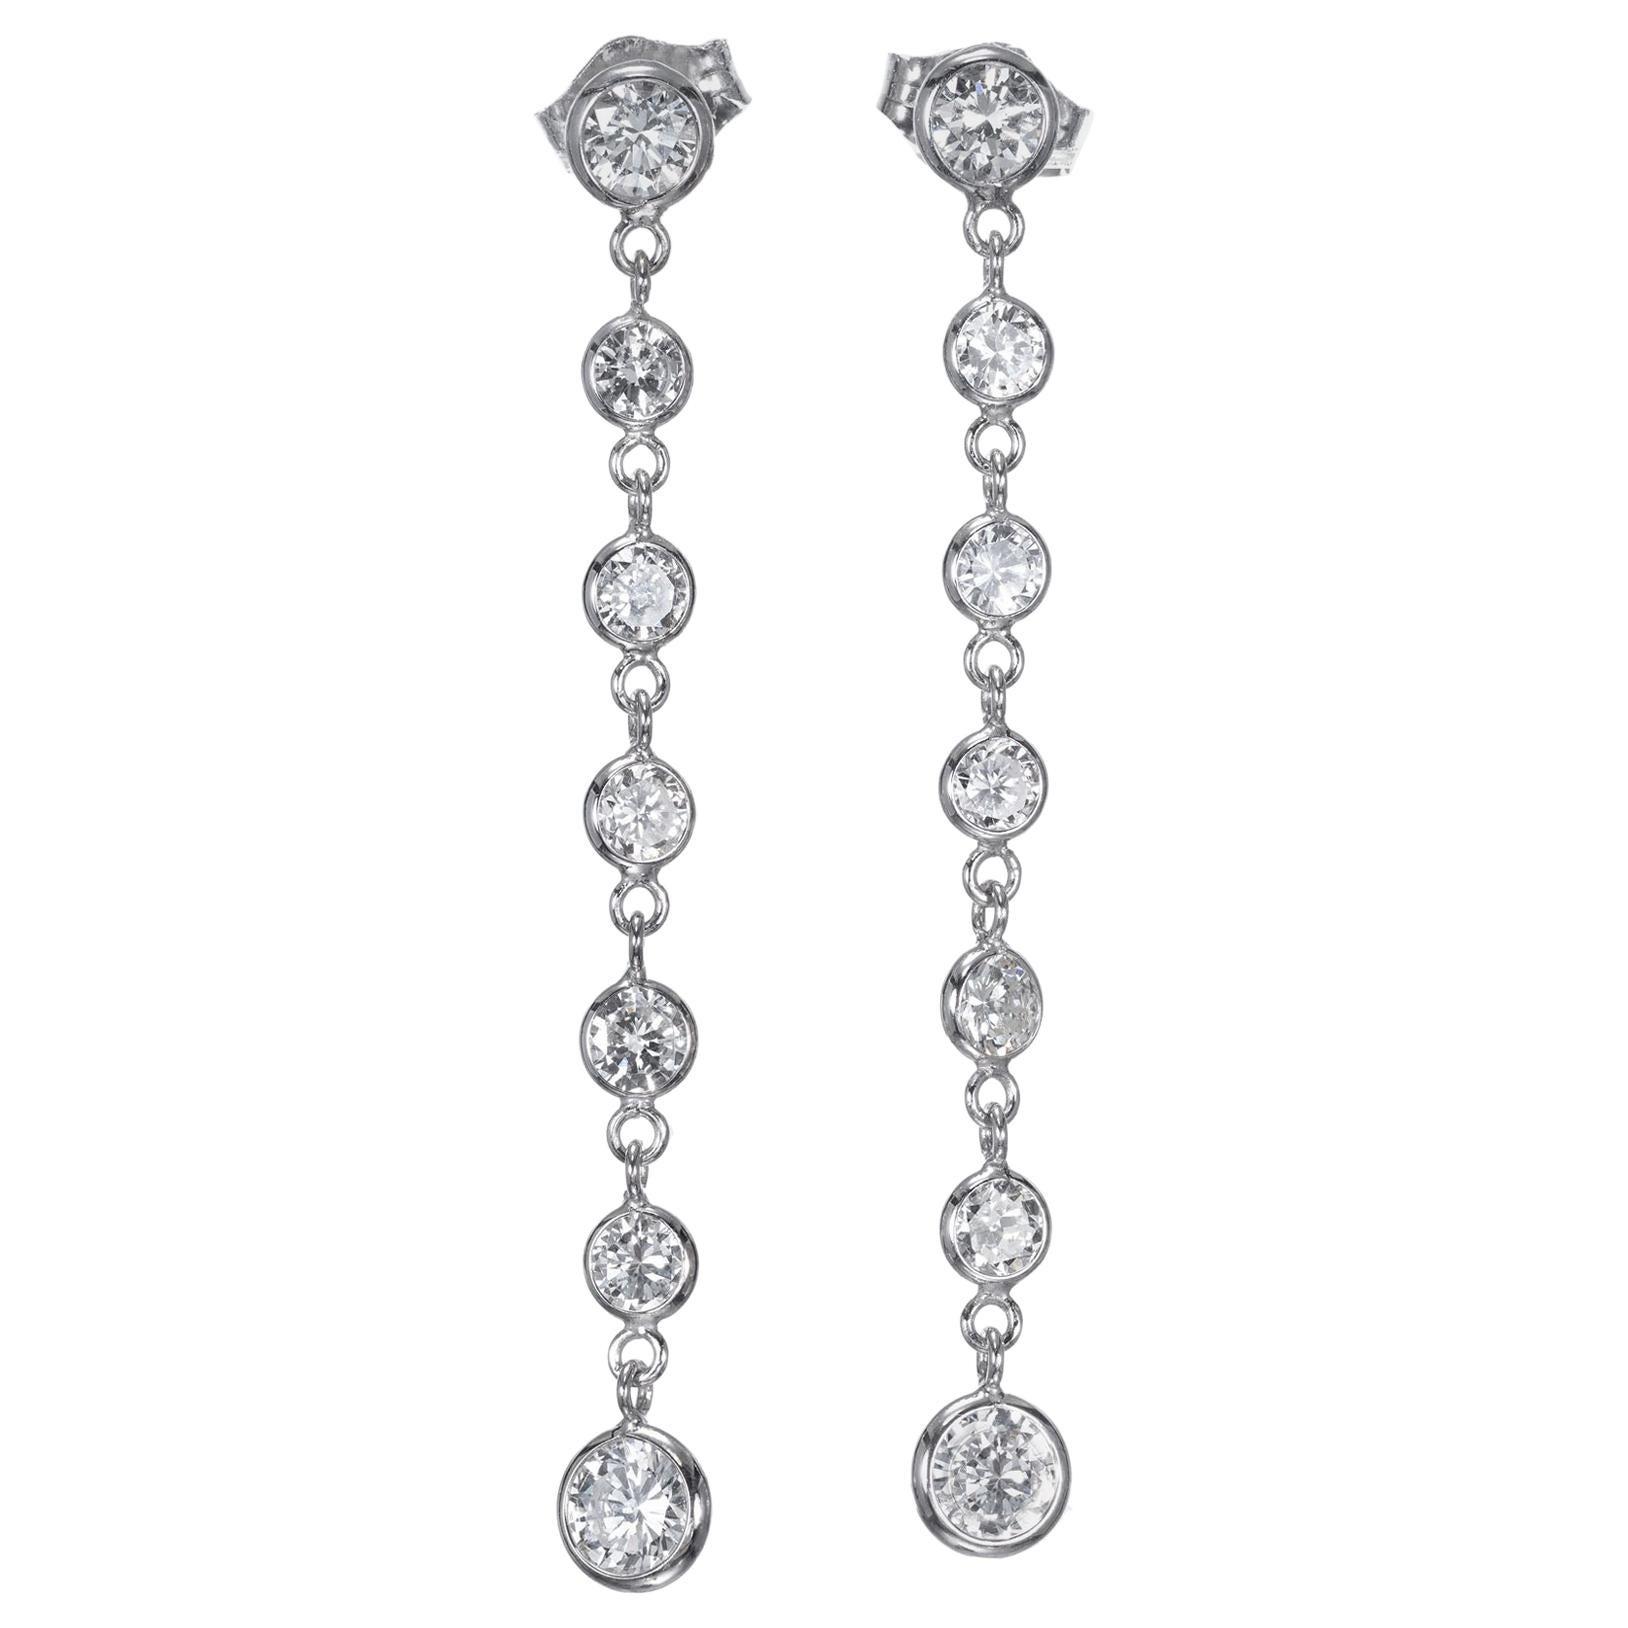 Peter Suchy 1.50 Carat Diamond Gold Dangle Drop Earrings